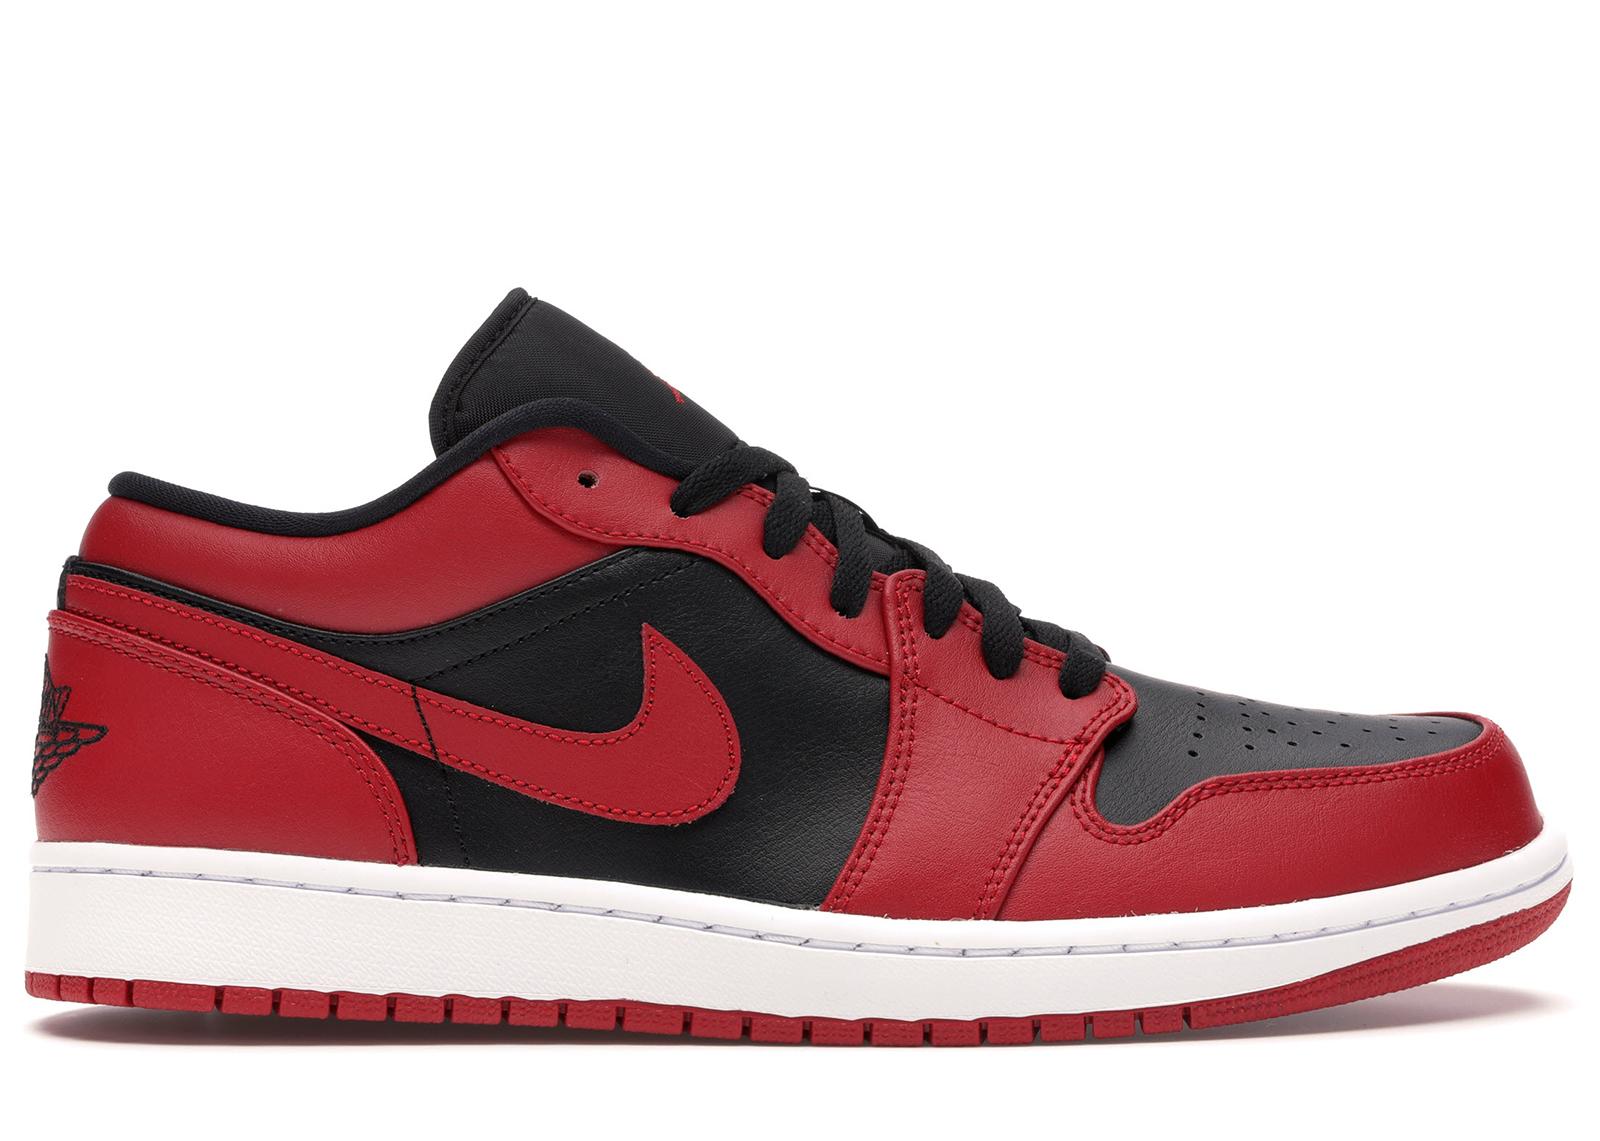 Buy Air Jordan 1 Low Shoes & Deadstock Sneakers